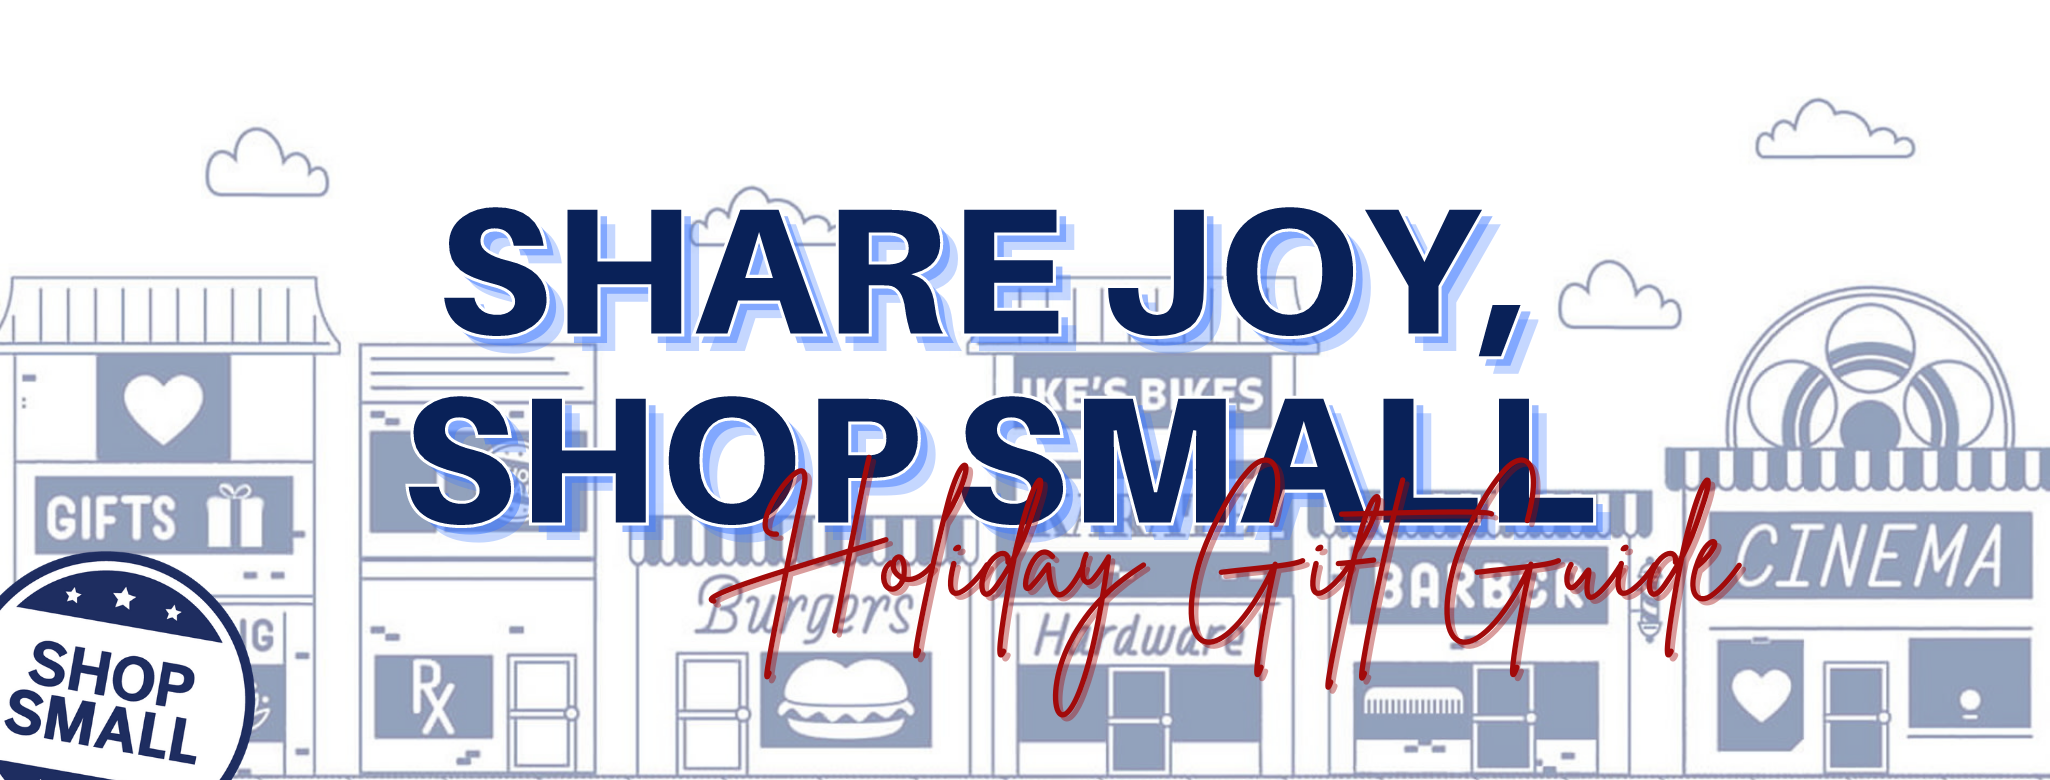 SHARE JOY, SHOP SMALL (3)